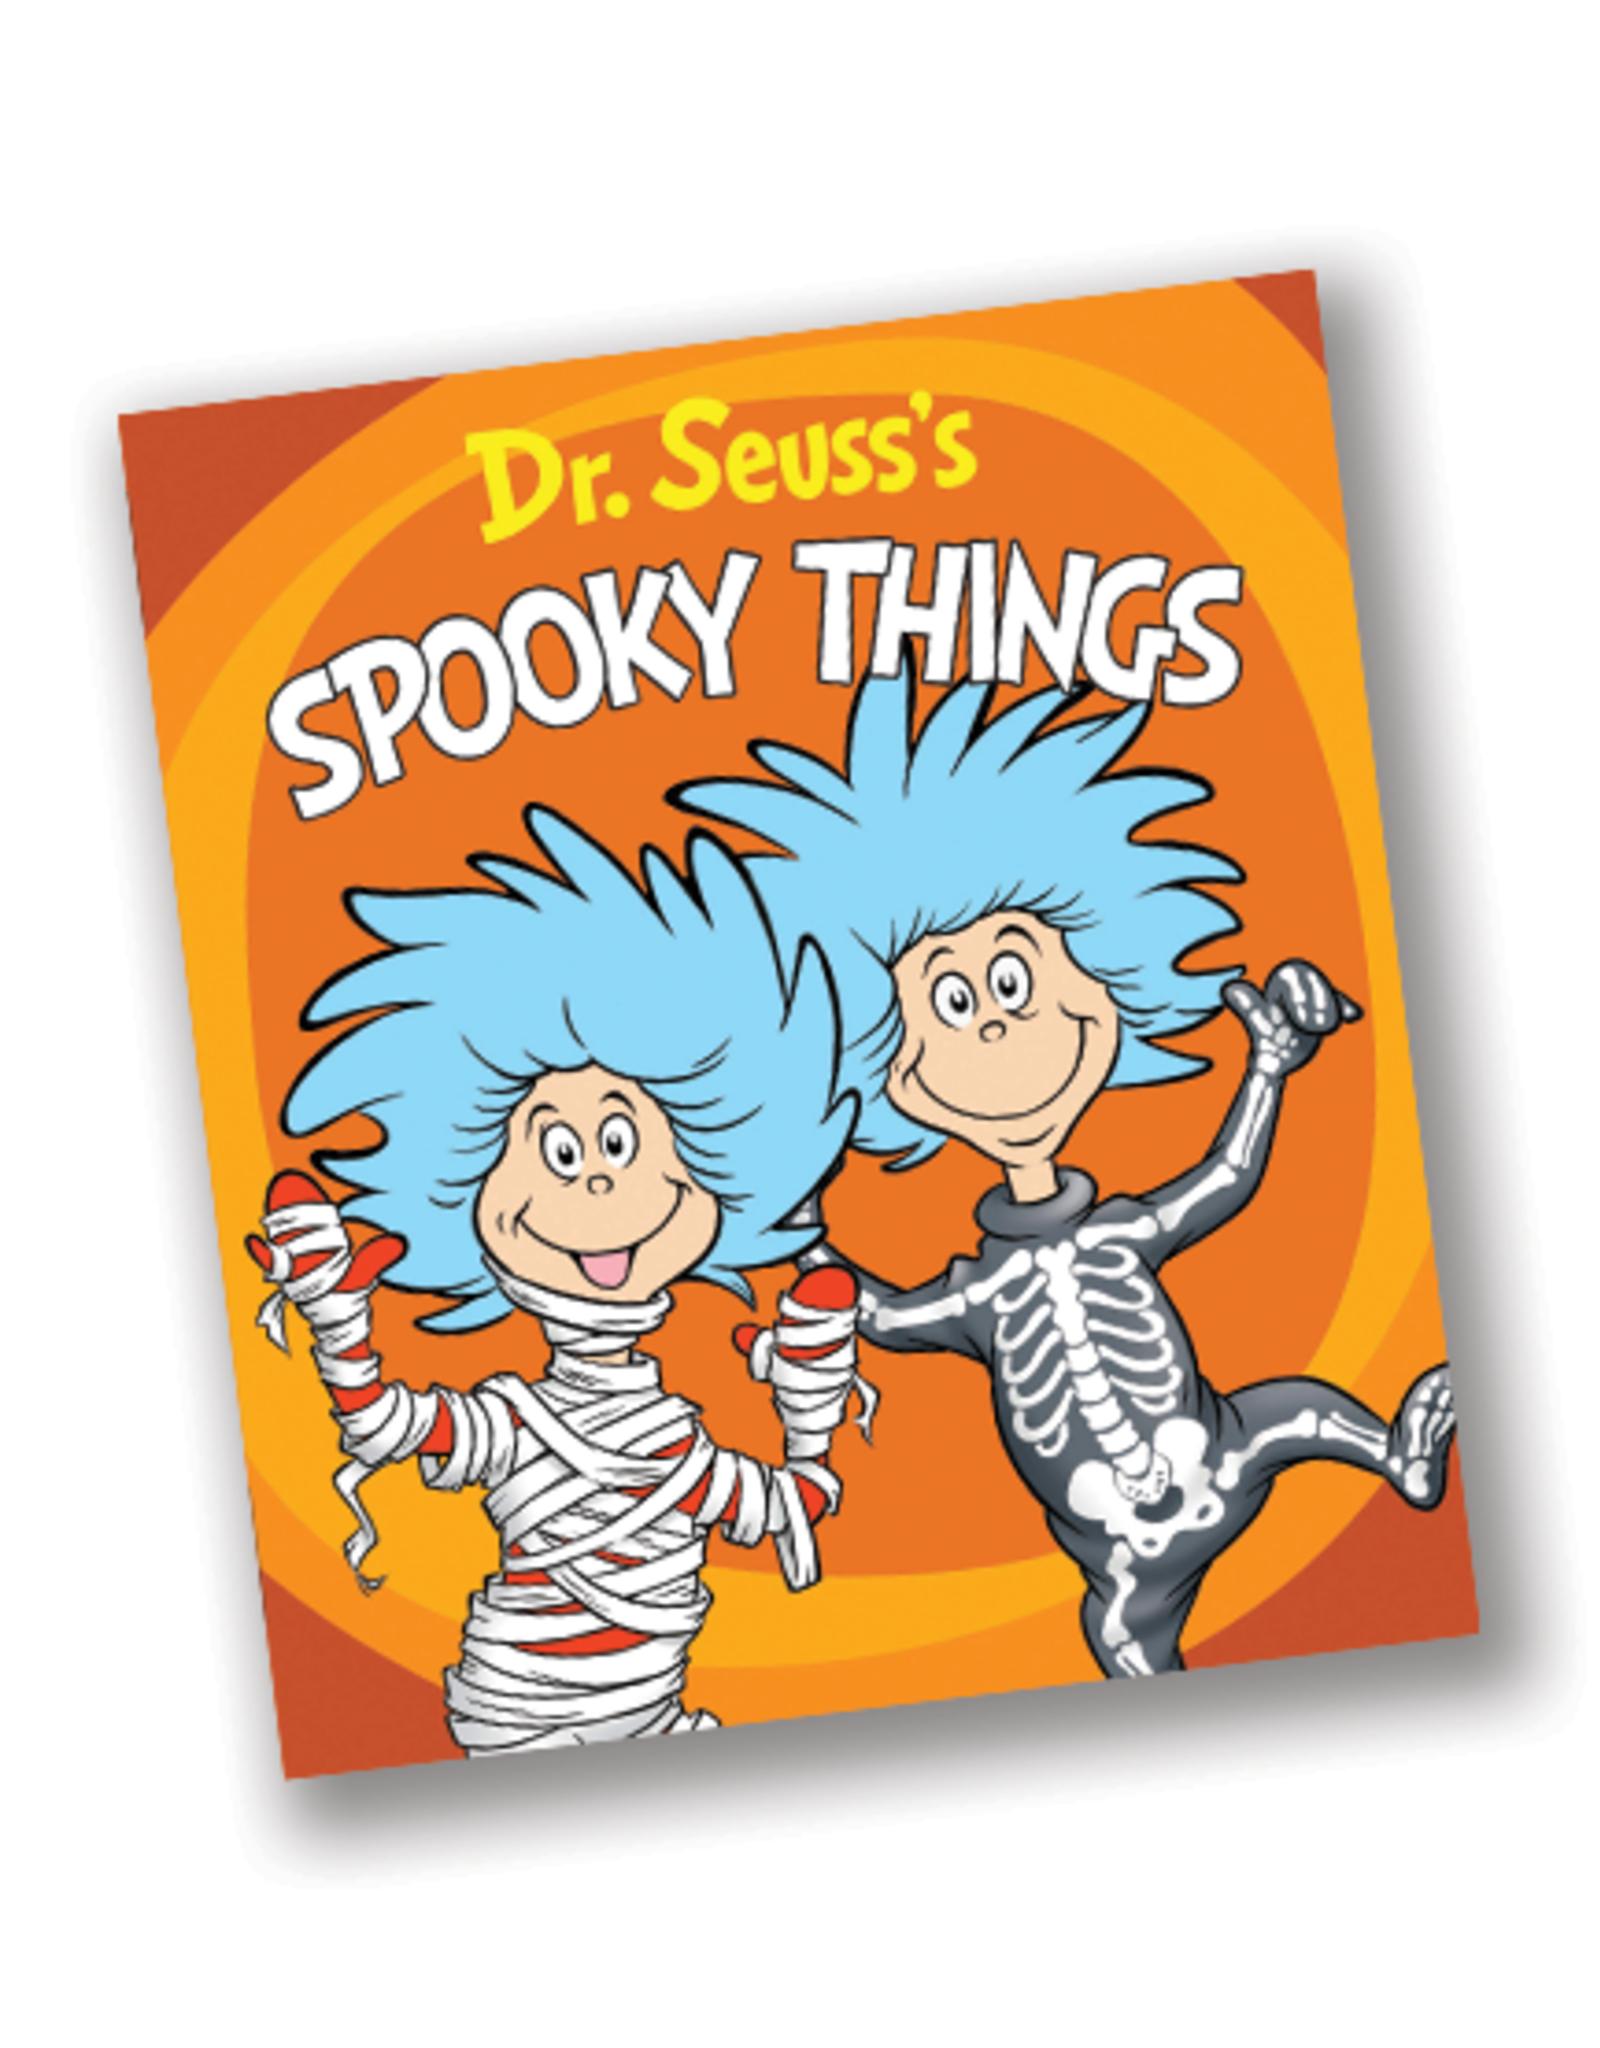 Dr. Seuss's Spooky Things (Board Book)